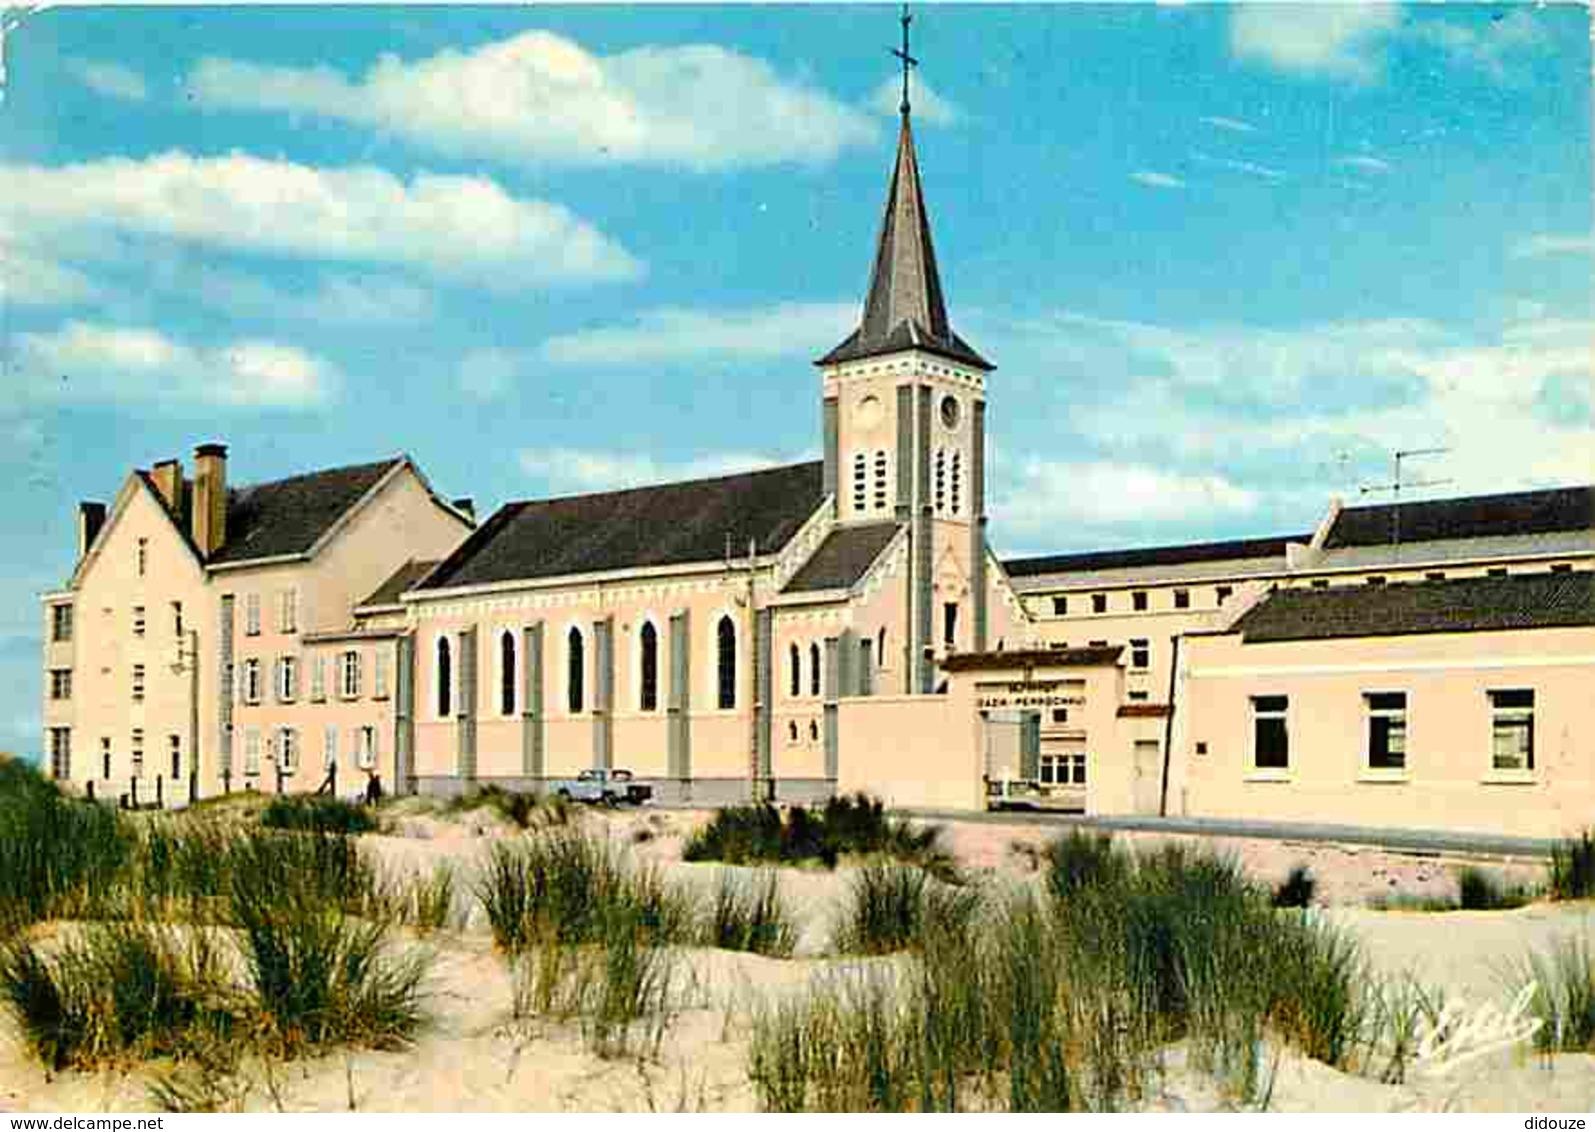 62 - Berck Sur Mer - L'Institut Cazin-Perrochaud - Flamme Postale - Voir Scans Recto-Verso - Berck